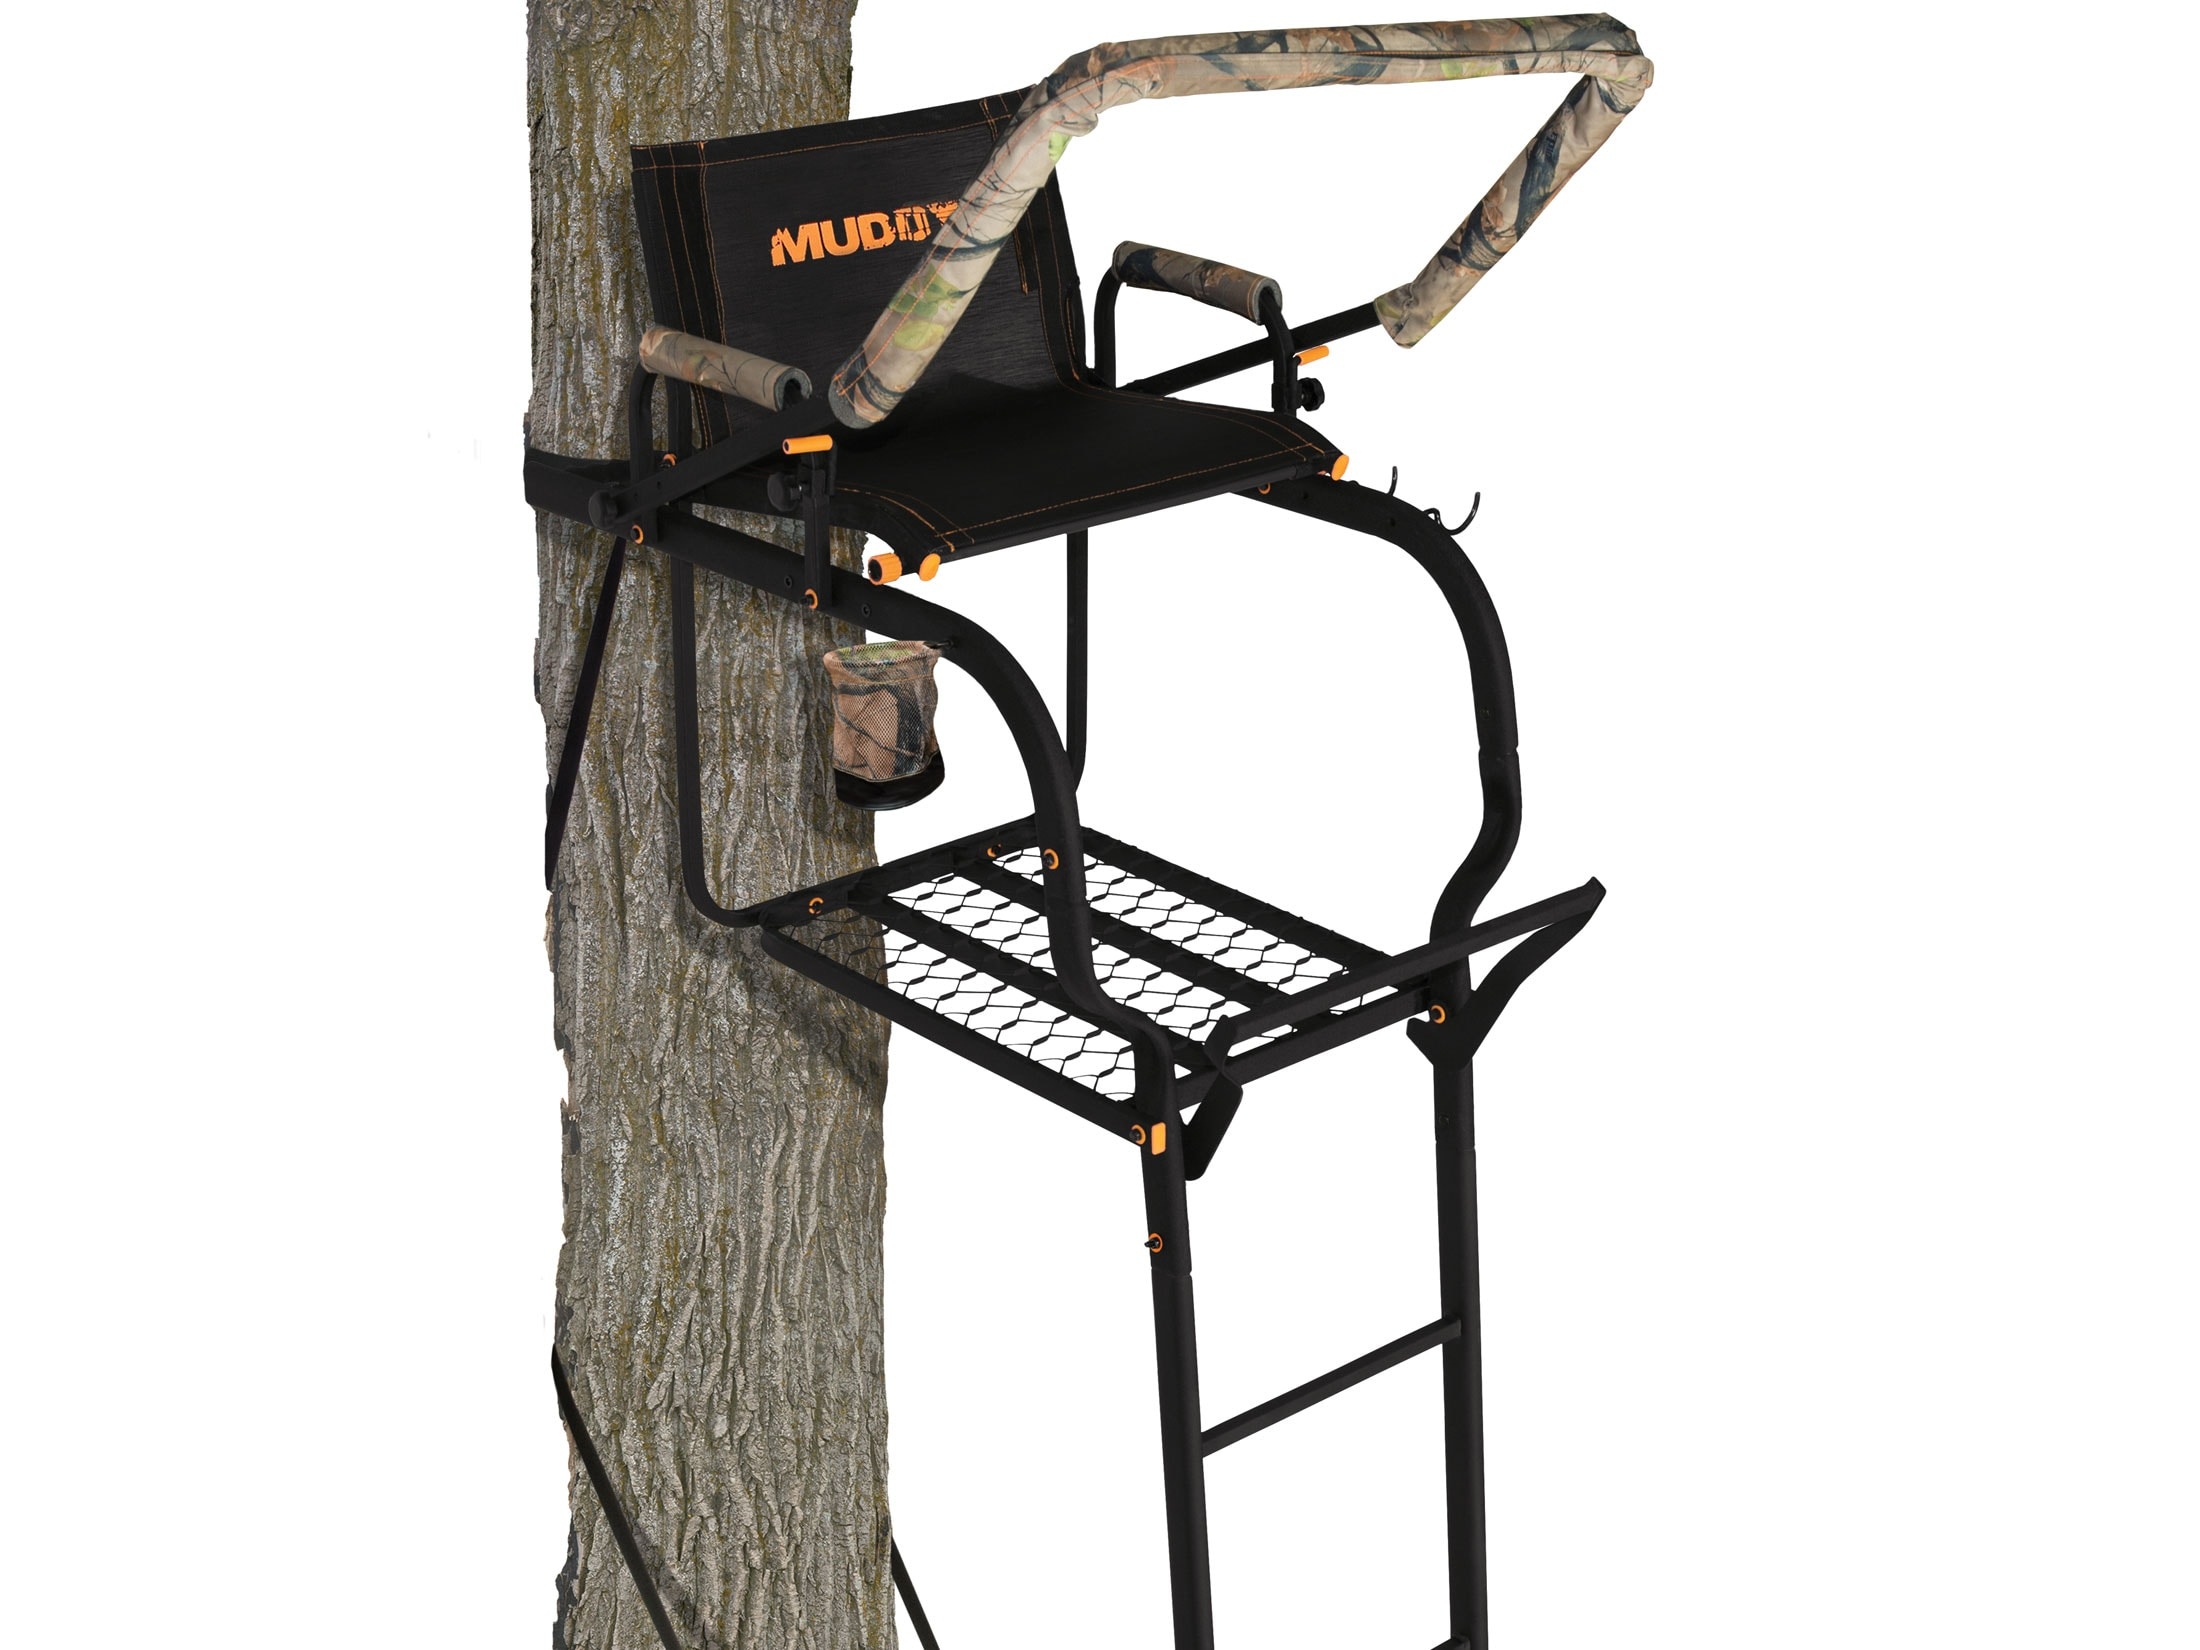 Muddy Odyssey Ladderstand Black